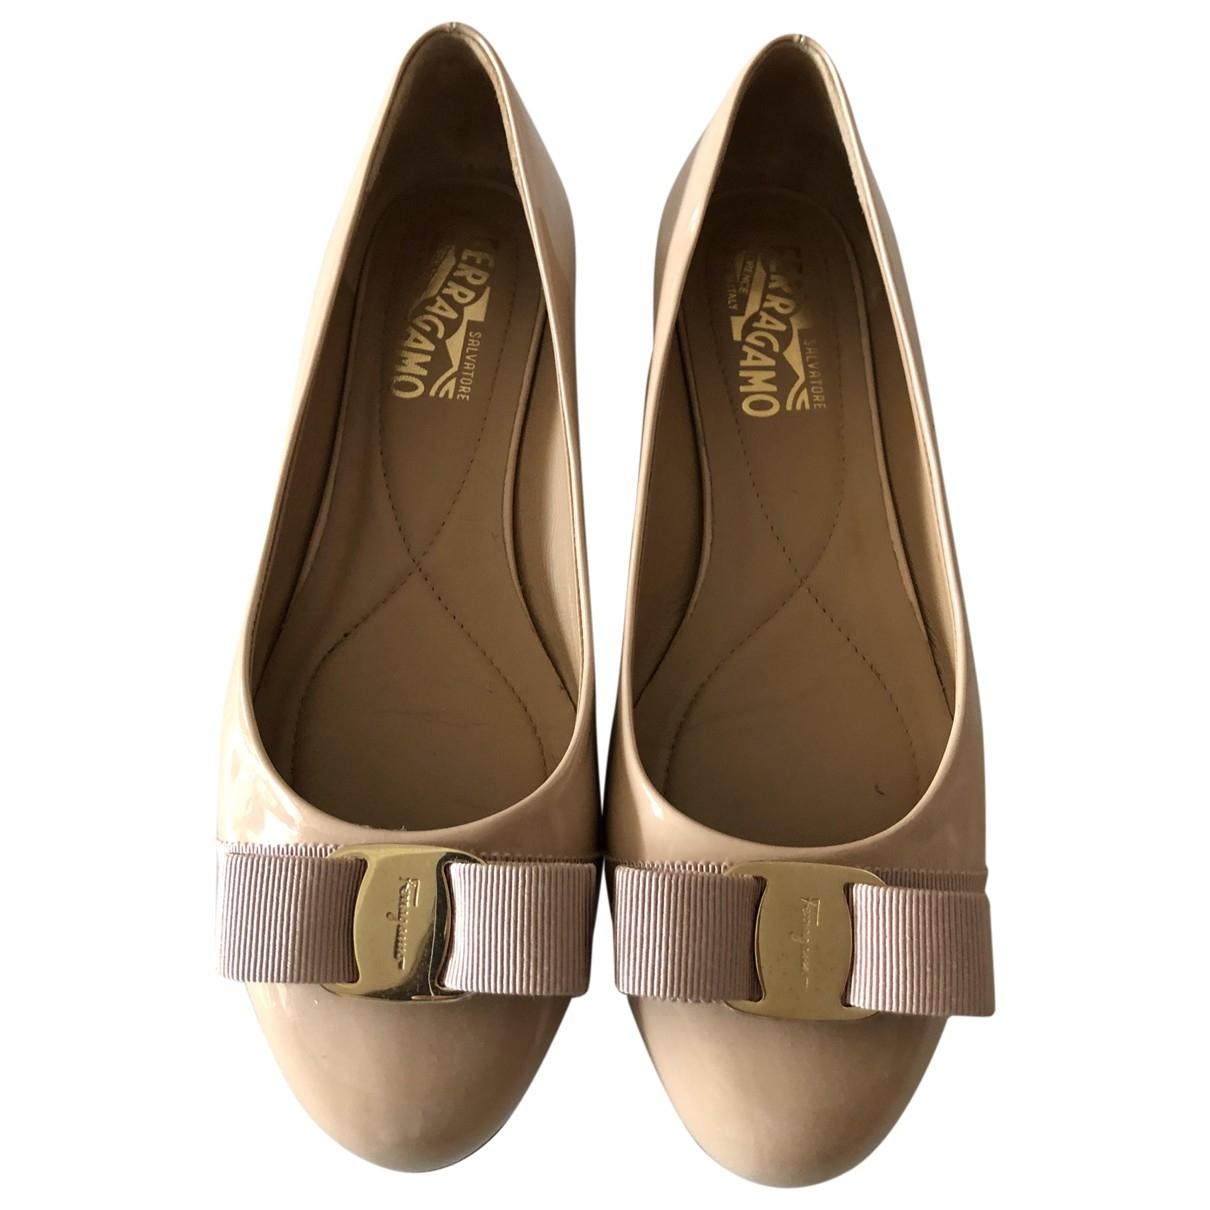 Salvatore Ferragamo \N Beige Patent leather Ballet flats for Women 7.5 US